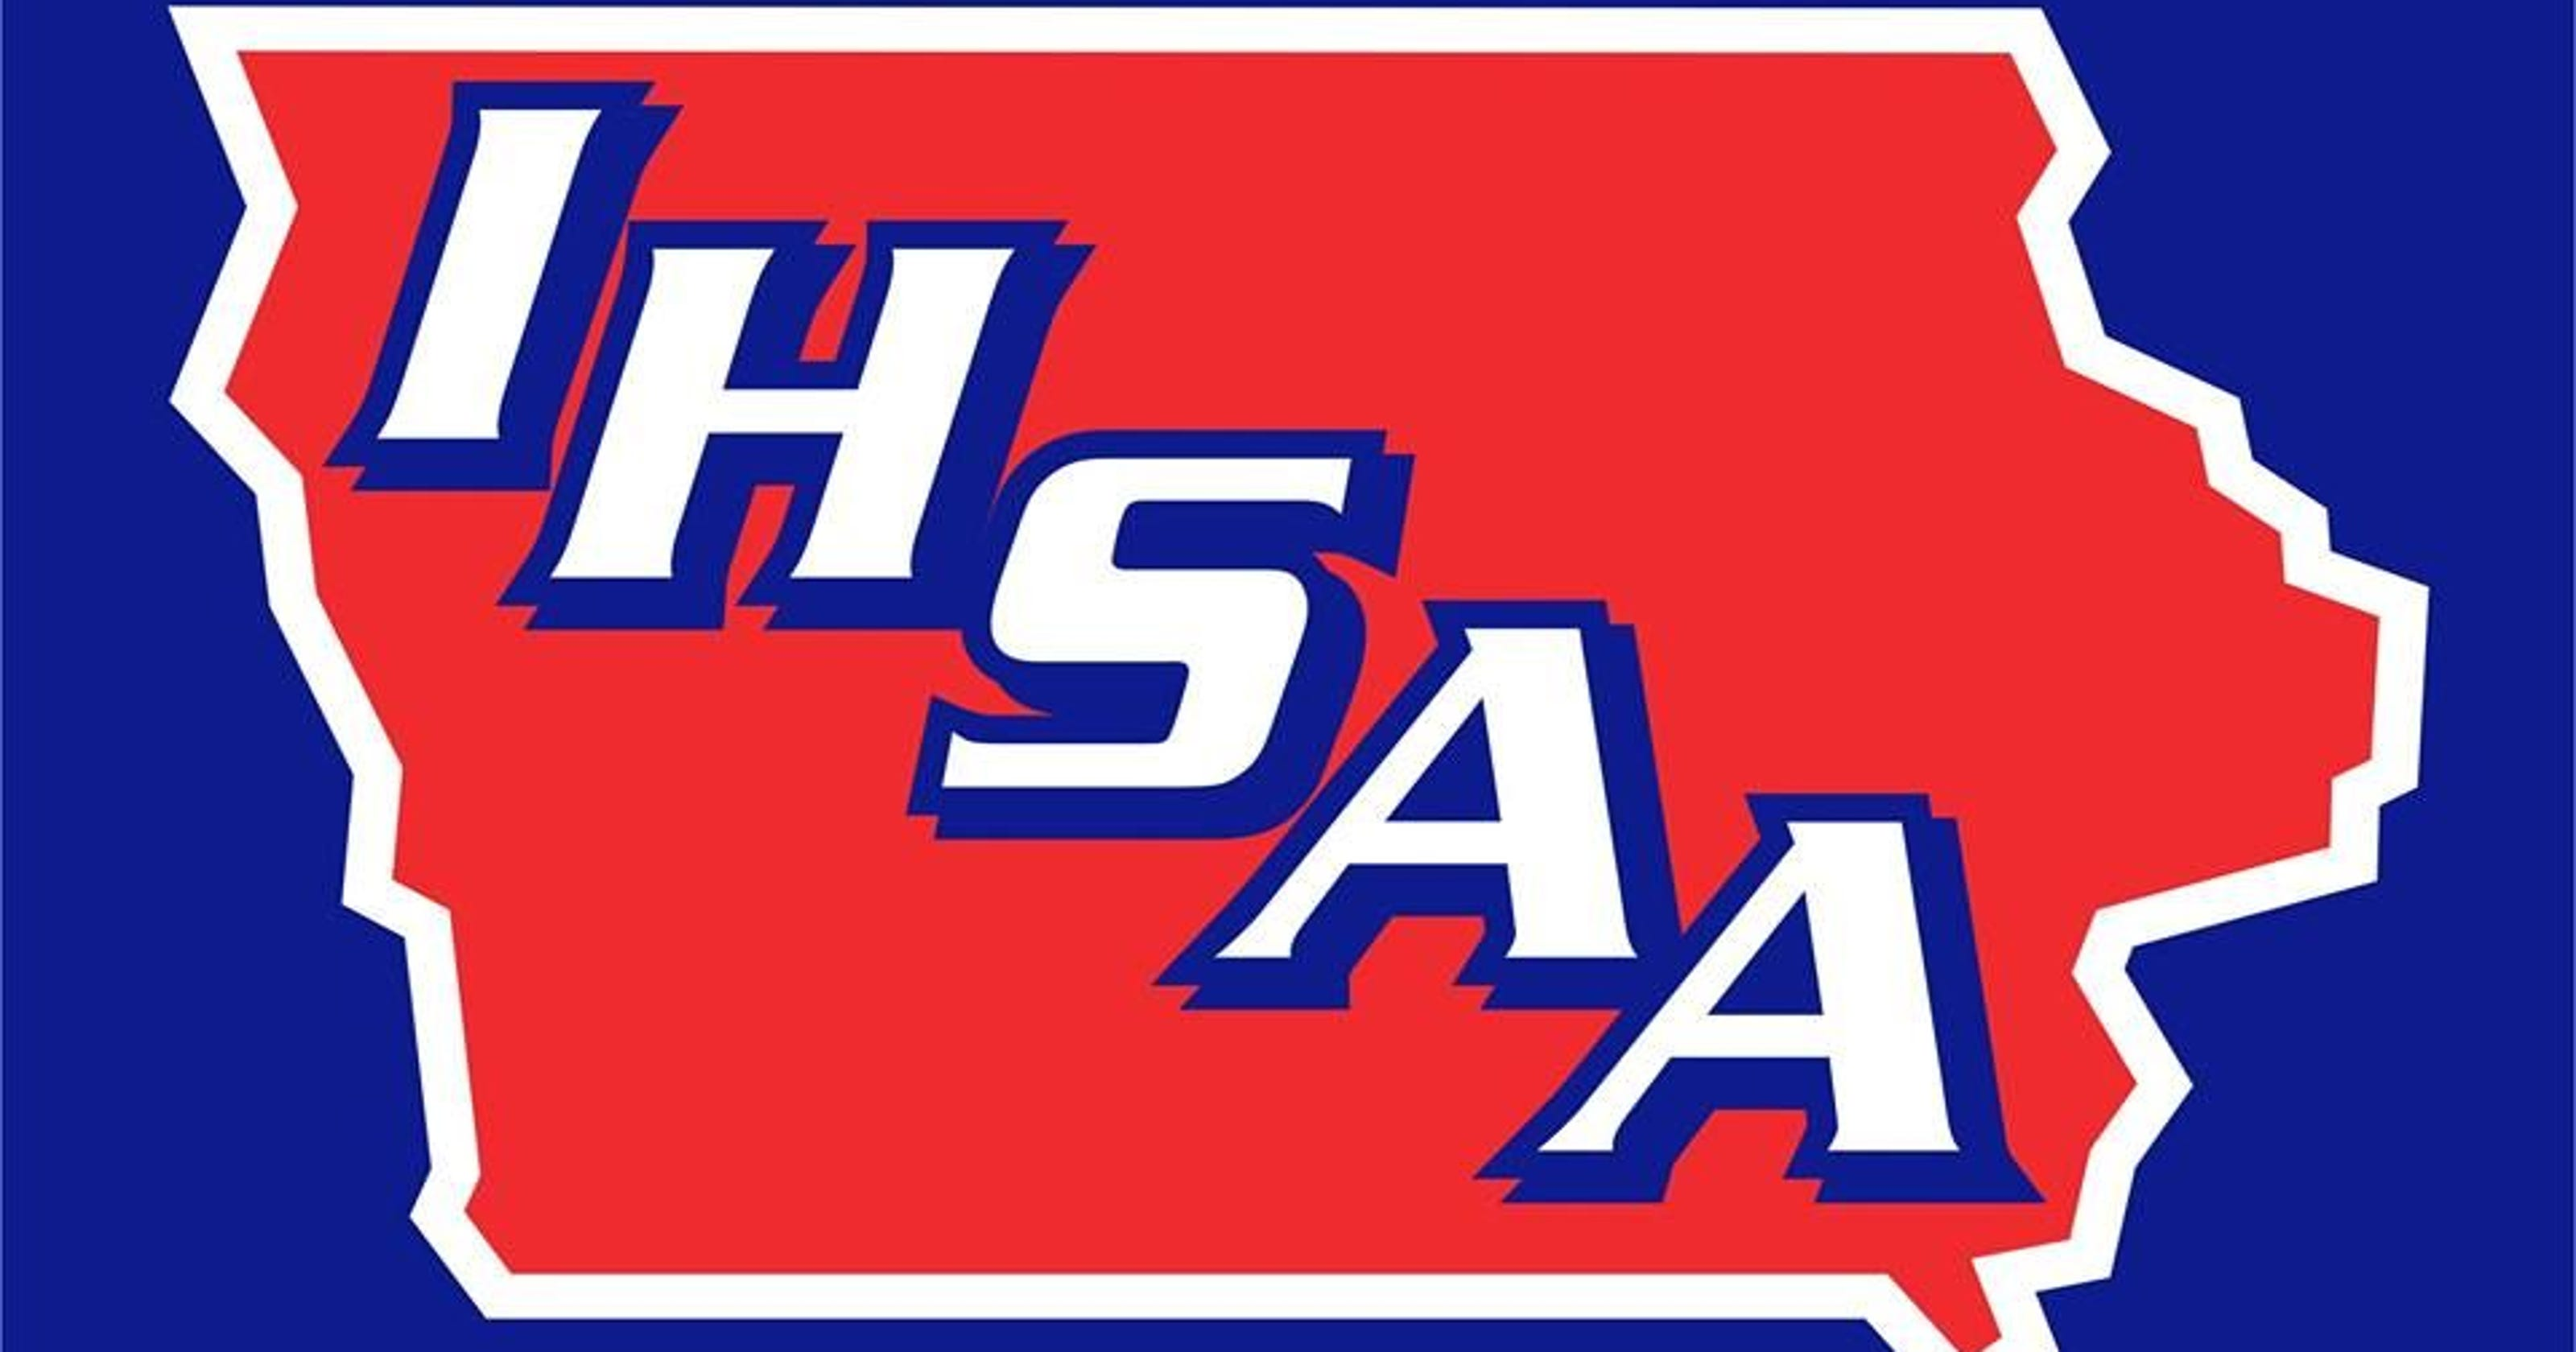 482e42aad Iowa high school football teams make history with final score  99-81. Yes